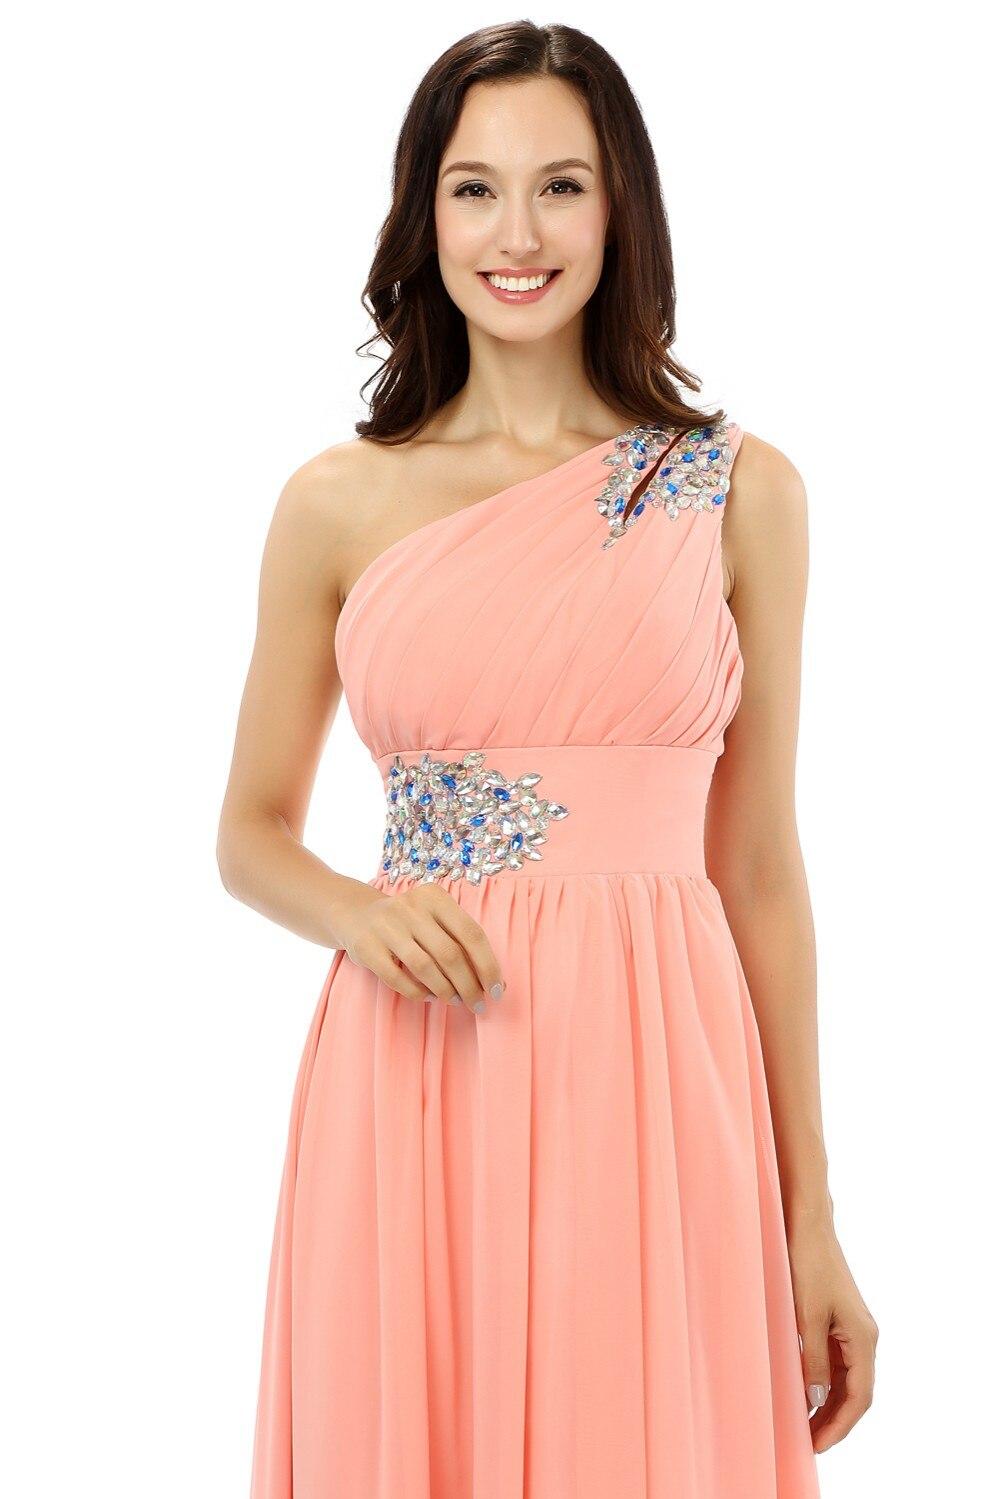 New 2018 Cheap Bridesmaid Dresses Under 50 A line One shoulder Floor ...